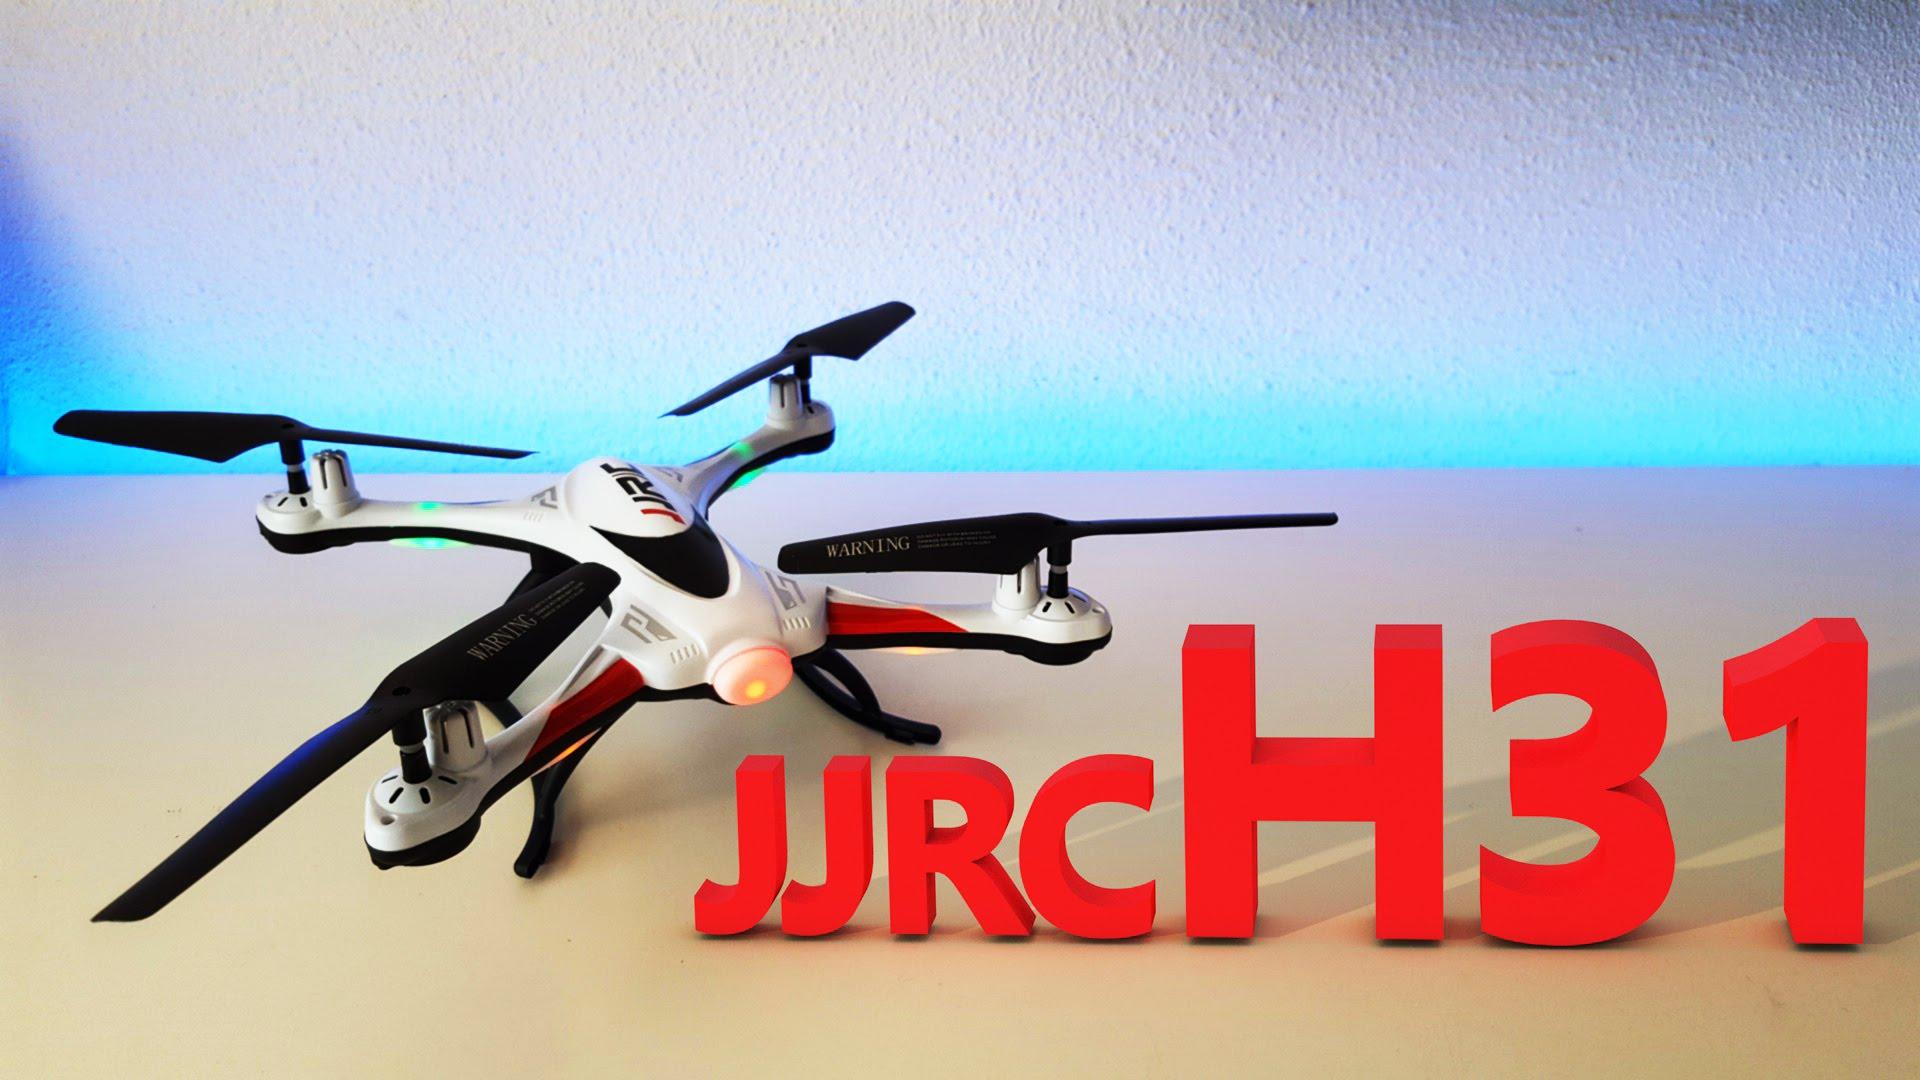 JJRC Quadcopter